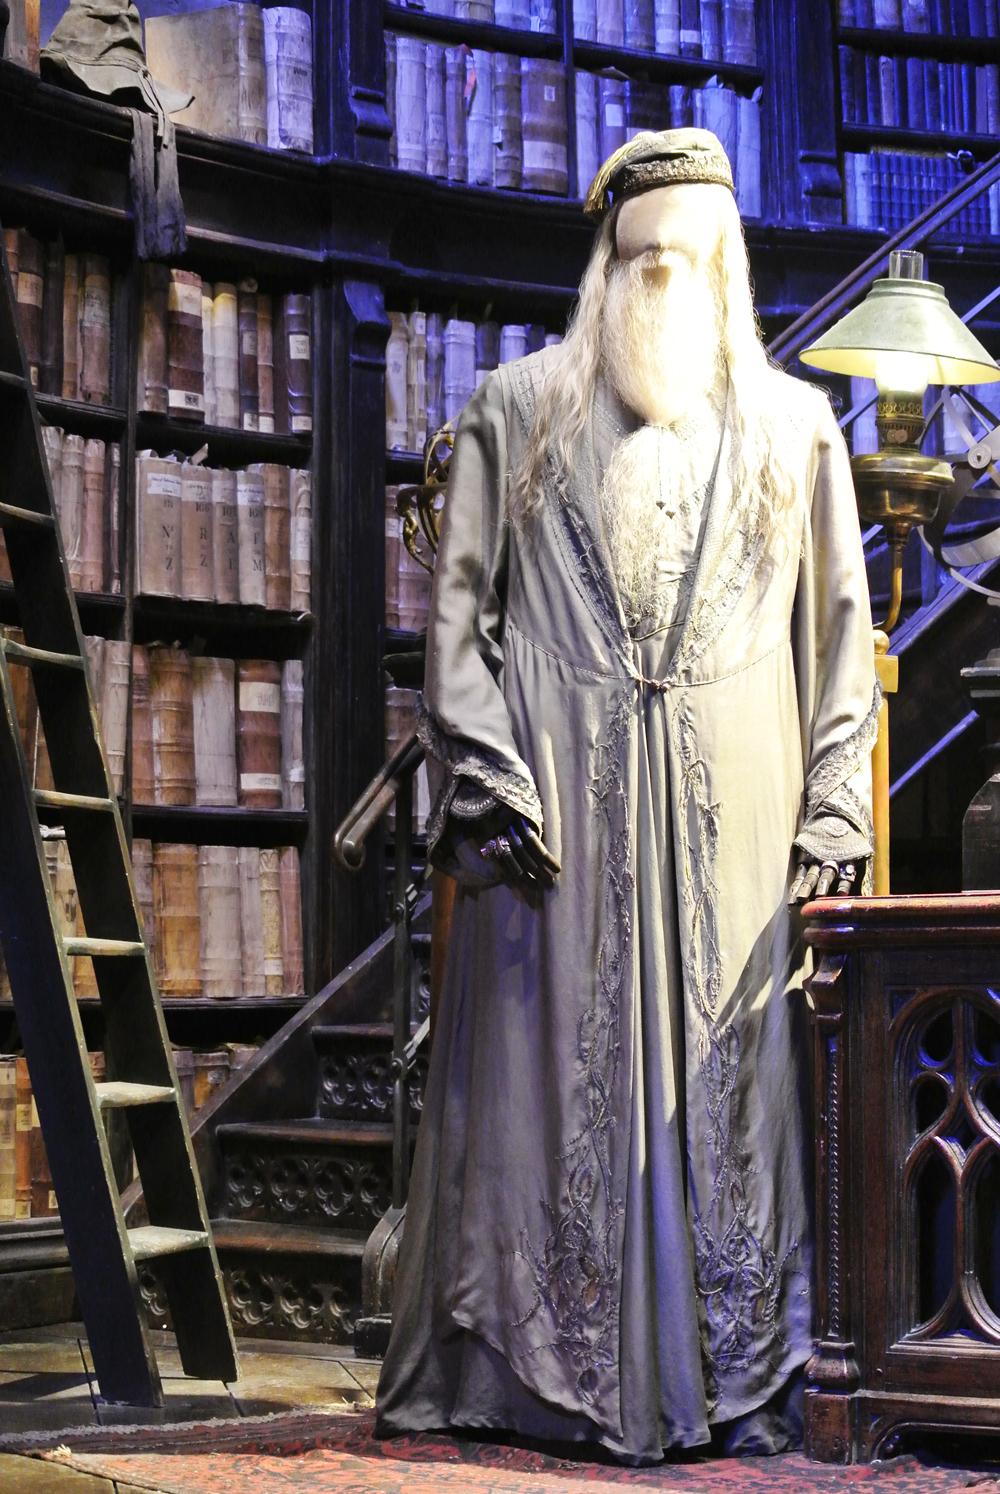 Warner Bros Studio Tour The Making of Harry Potter - Dumbledore's Office